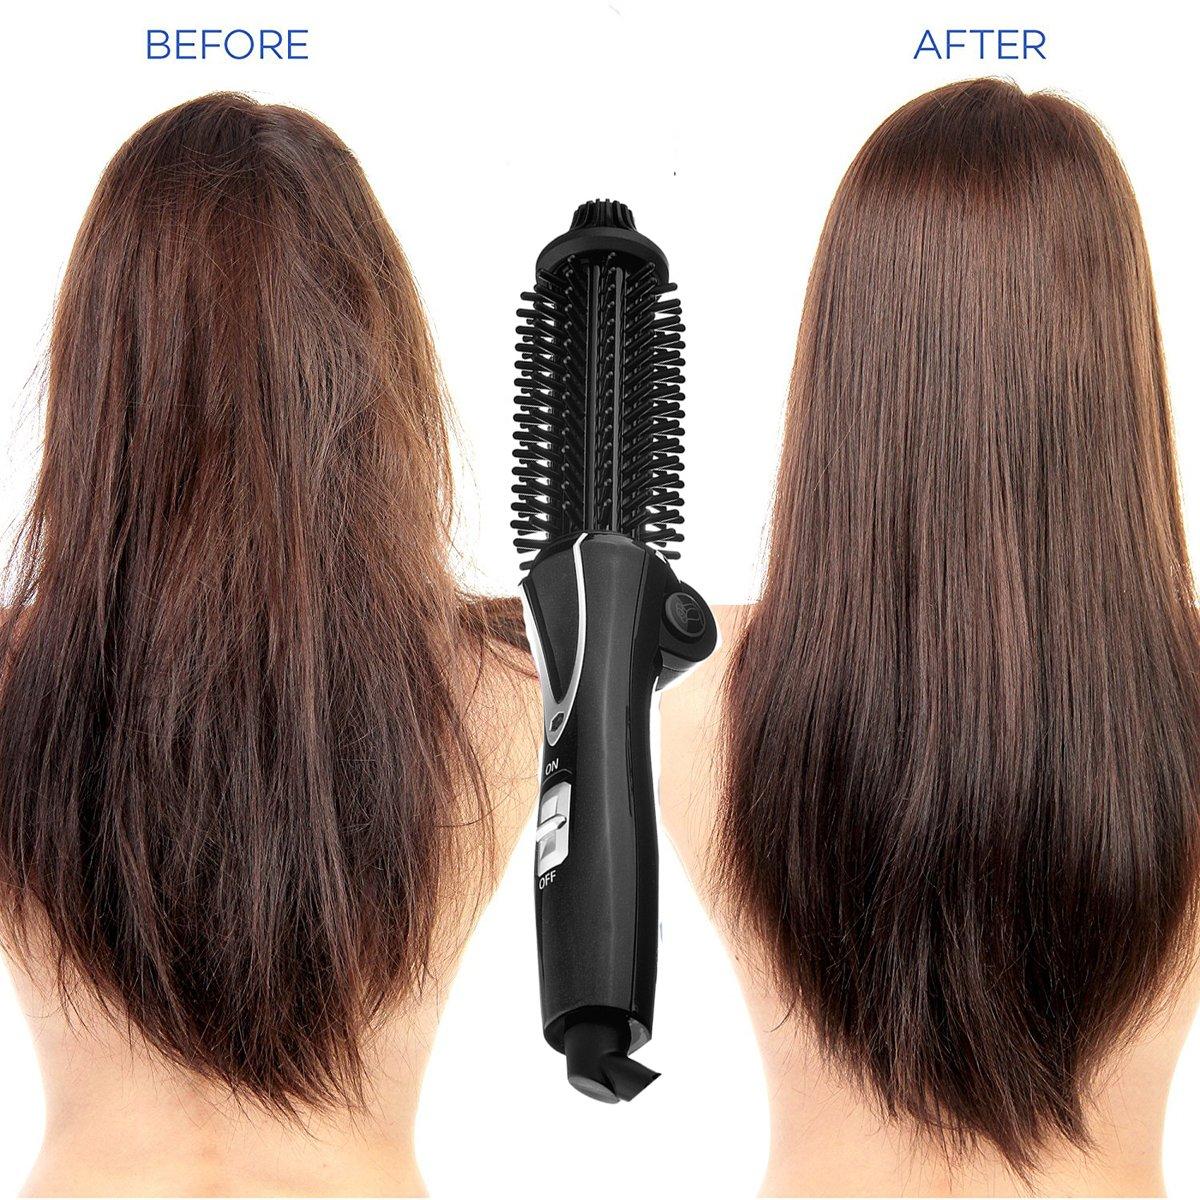 Caliente pelo Styler, szwintec 26 mm barril de cerámica Multi Función de tamaño mediano cepillo de pelo cabello cepillo & Cabello rizador para salón Glamour ...